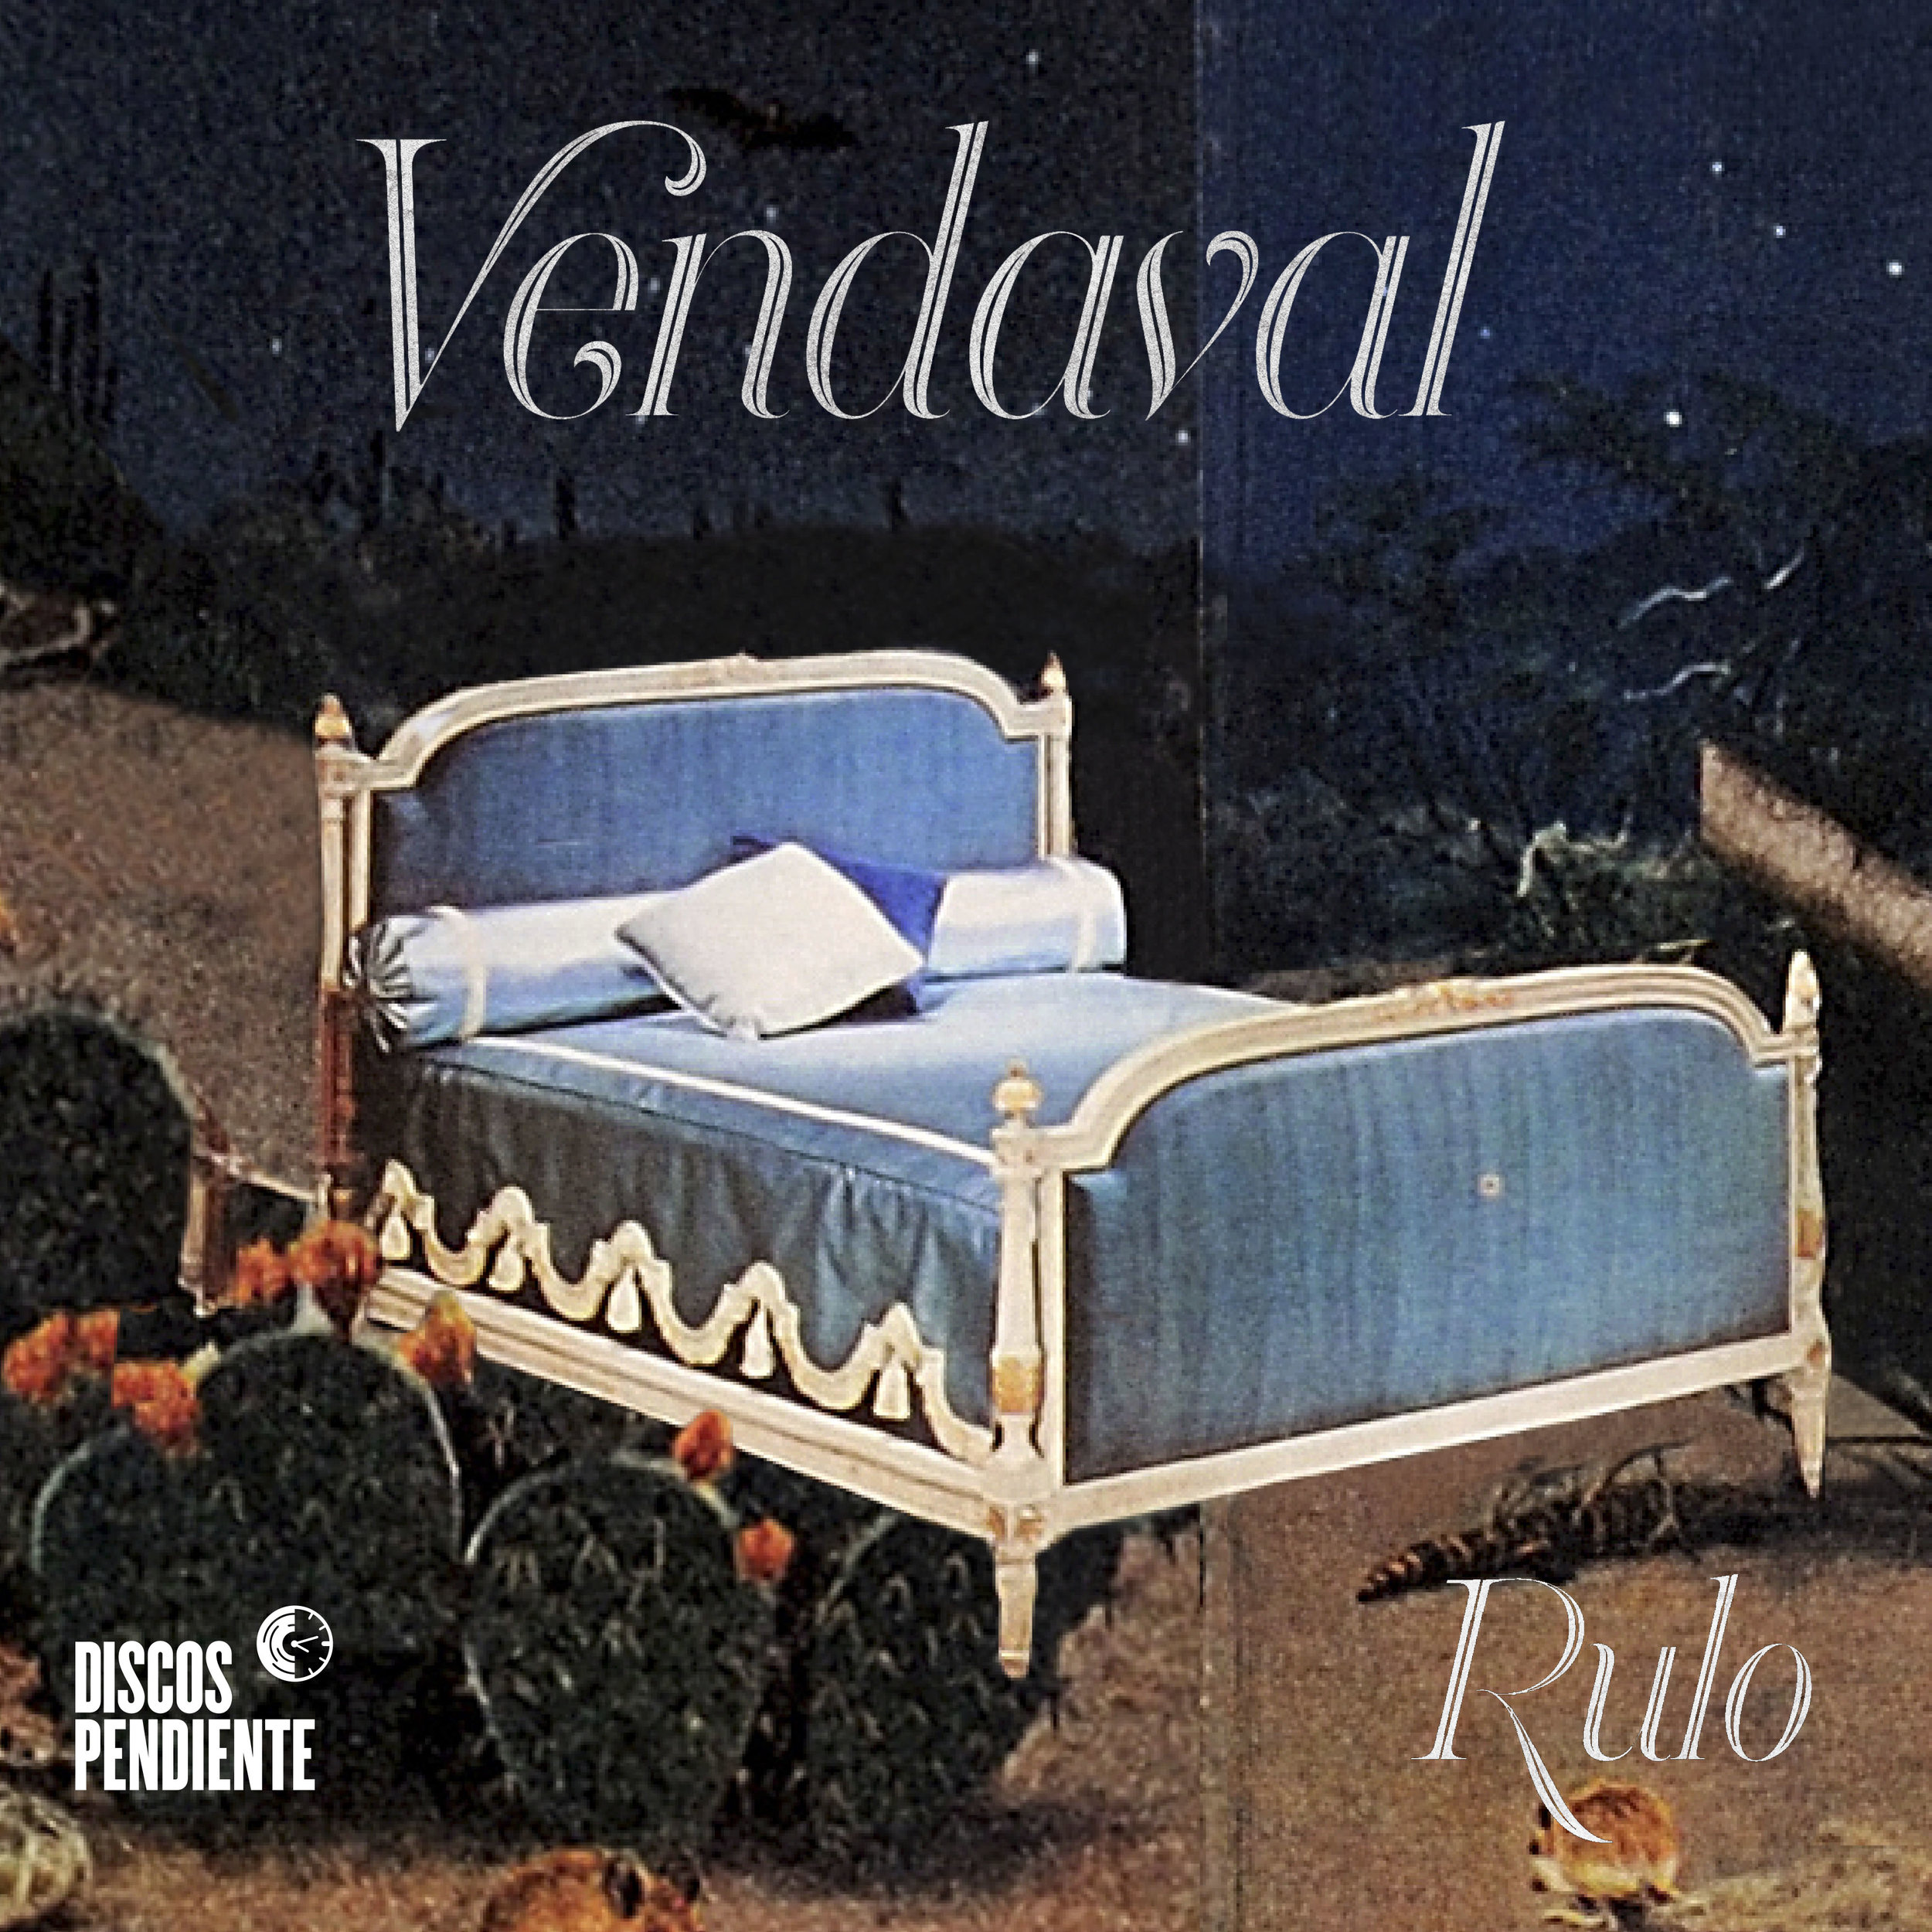 Cover Vendaval (©2016 Discos Pendiente).jpg